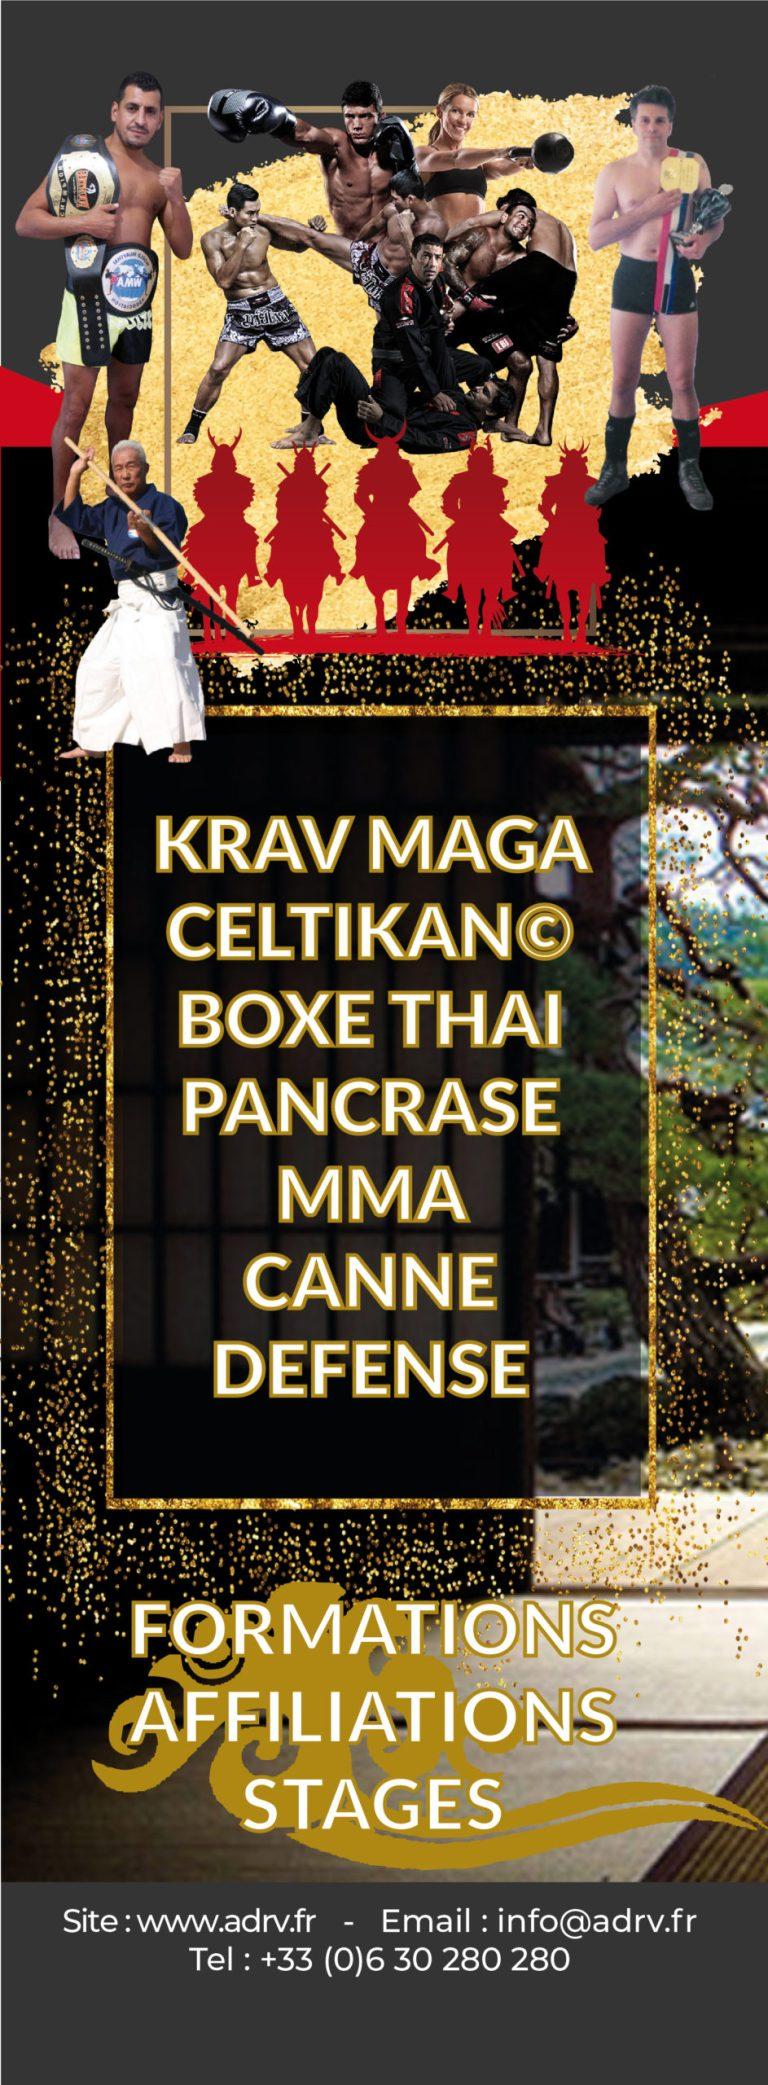 Krav Maga, Celtikan, Boxe Thaï,arts martiaux, boxe chinoise, qin nan fa, canne defense,